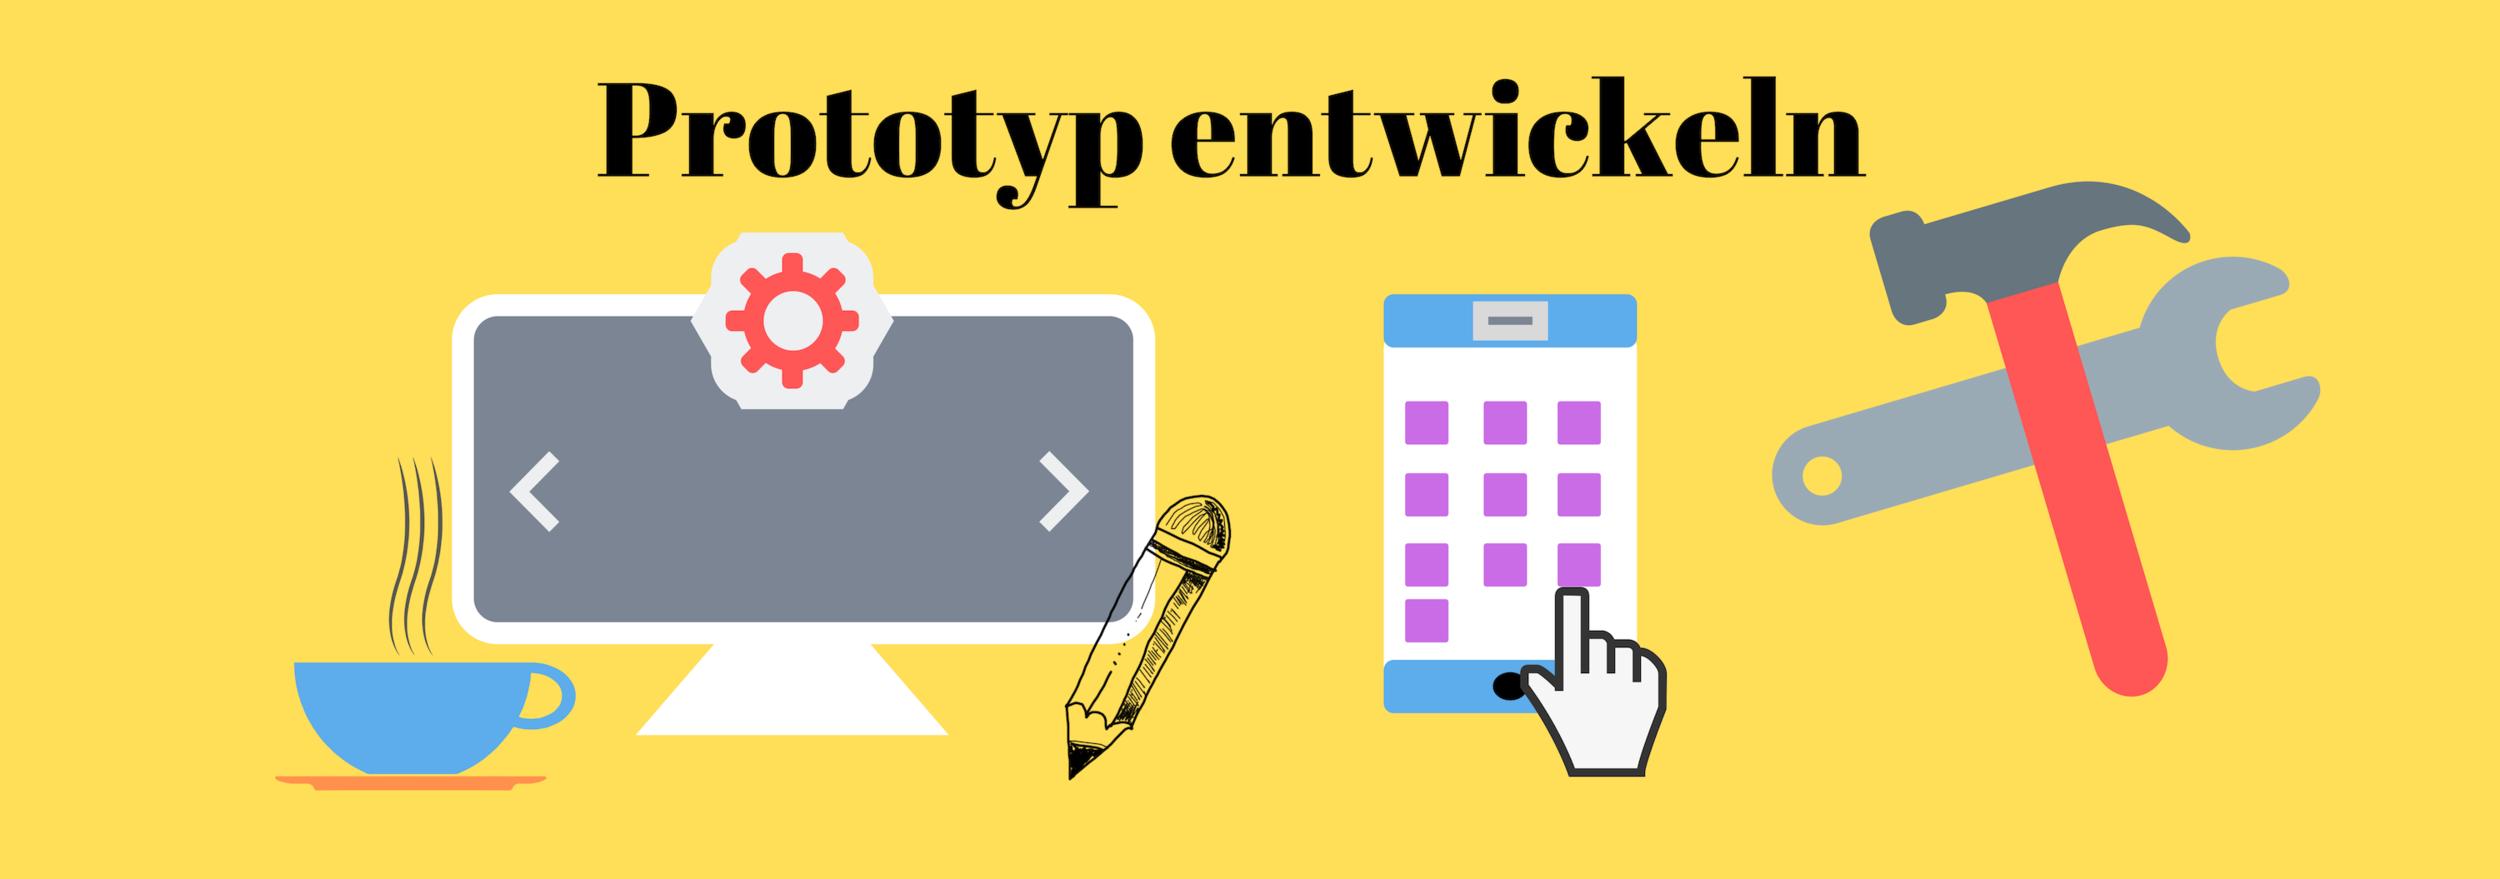 prototyping_methoden (1).png